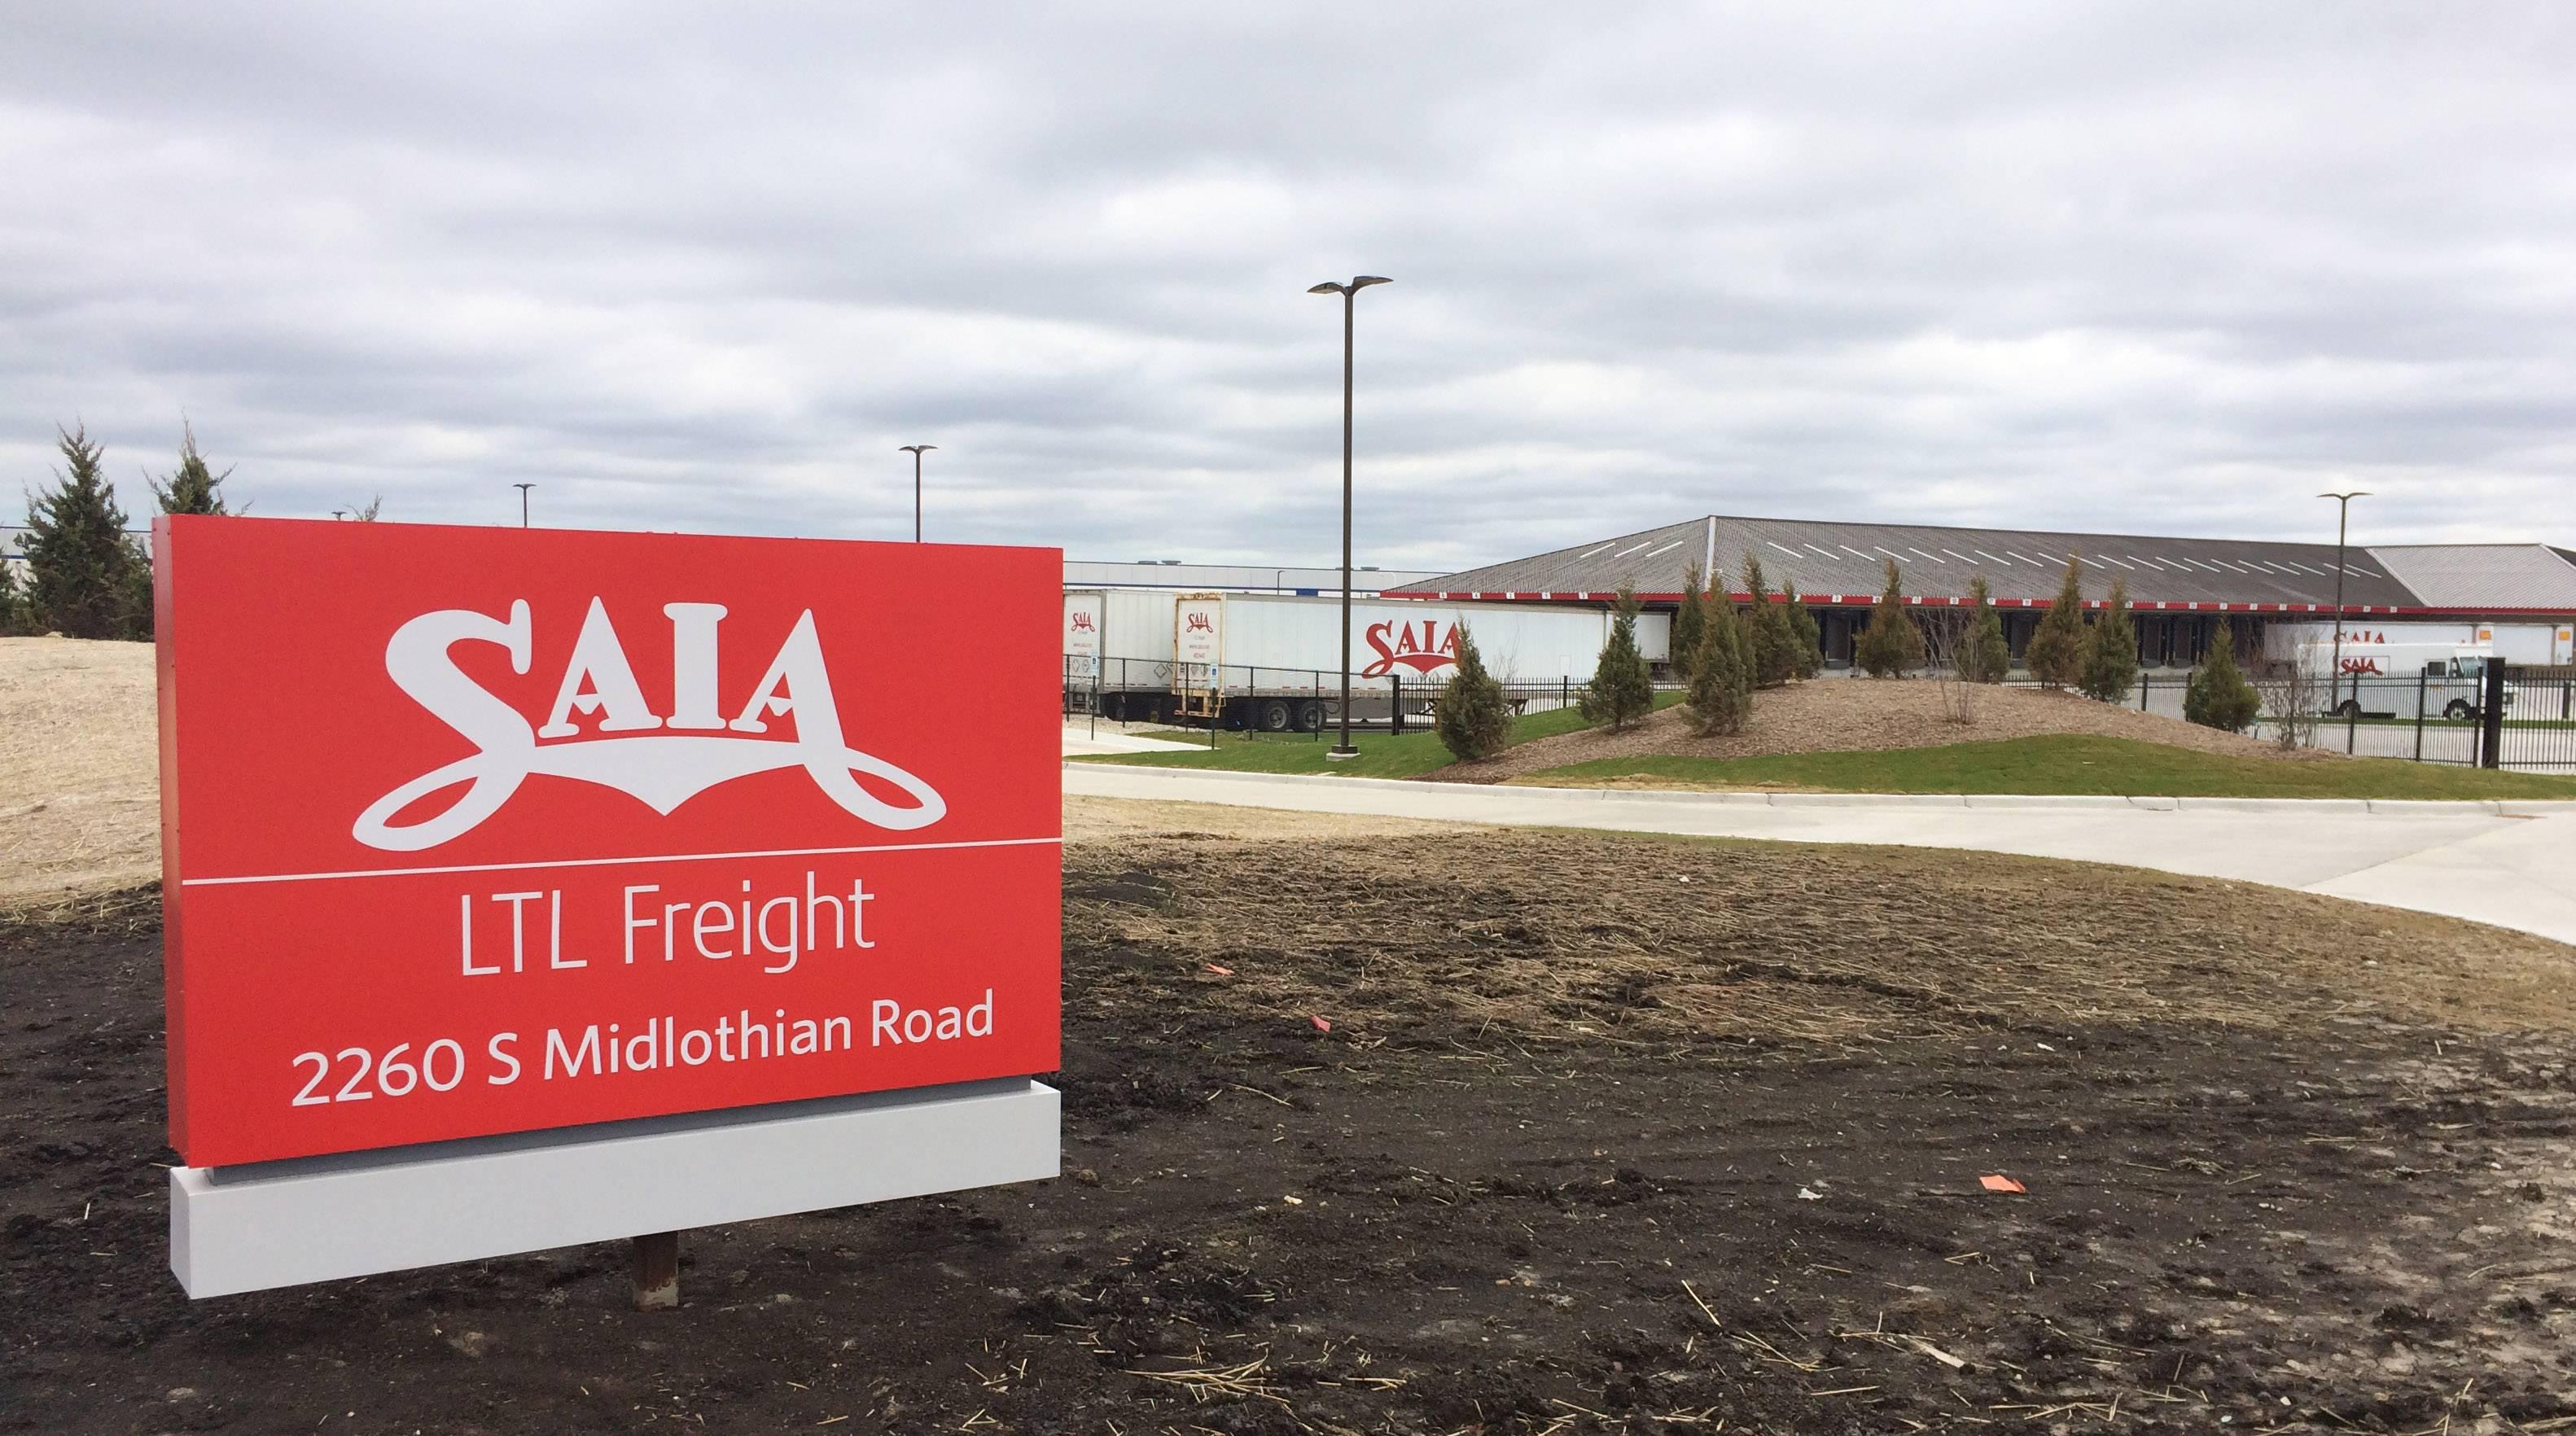 Saia truck terminal in Grayslake open for business despite legal ...